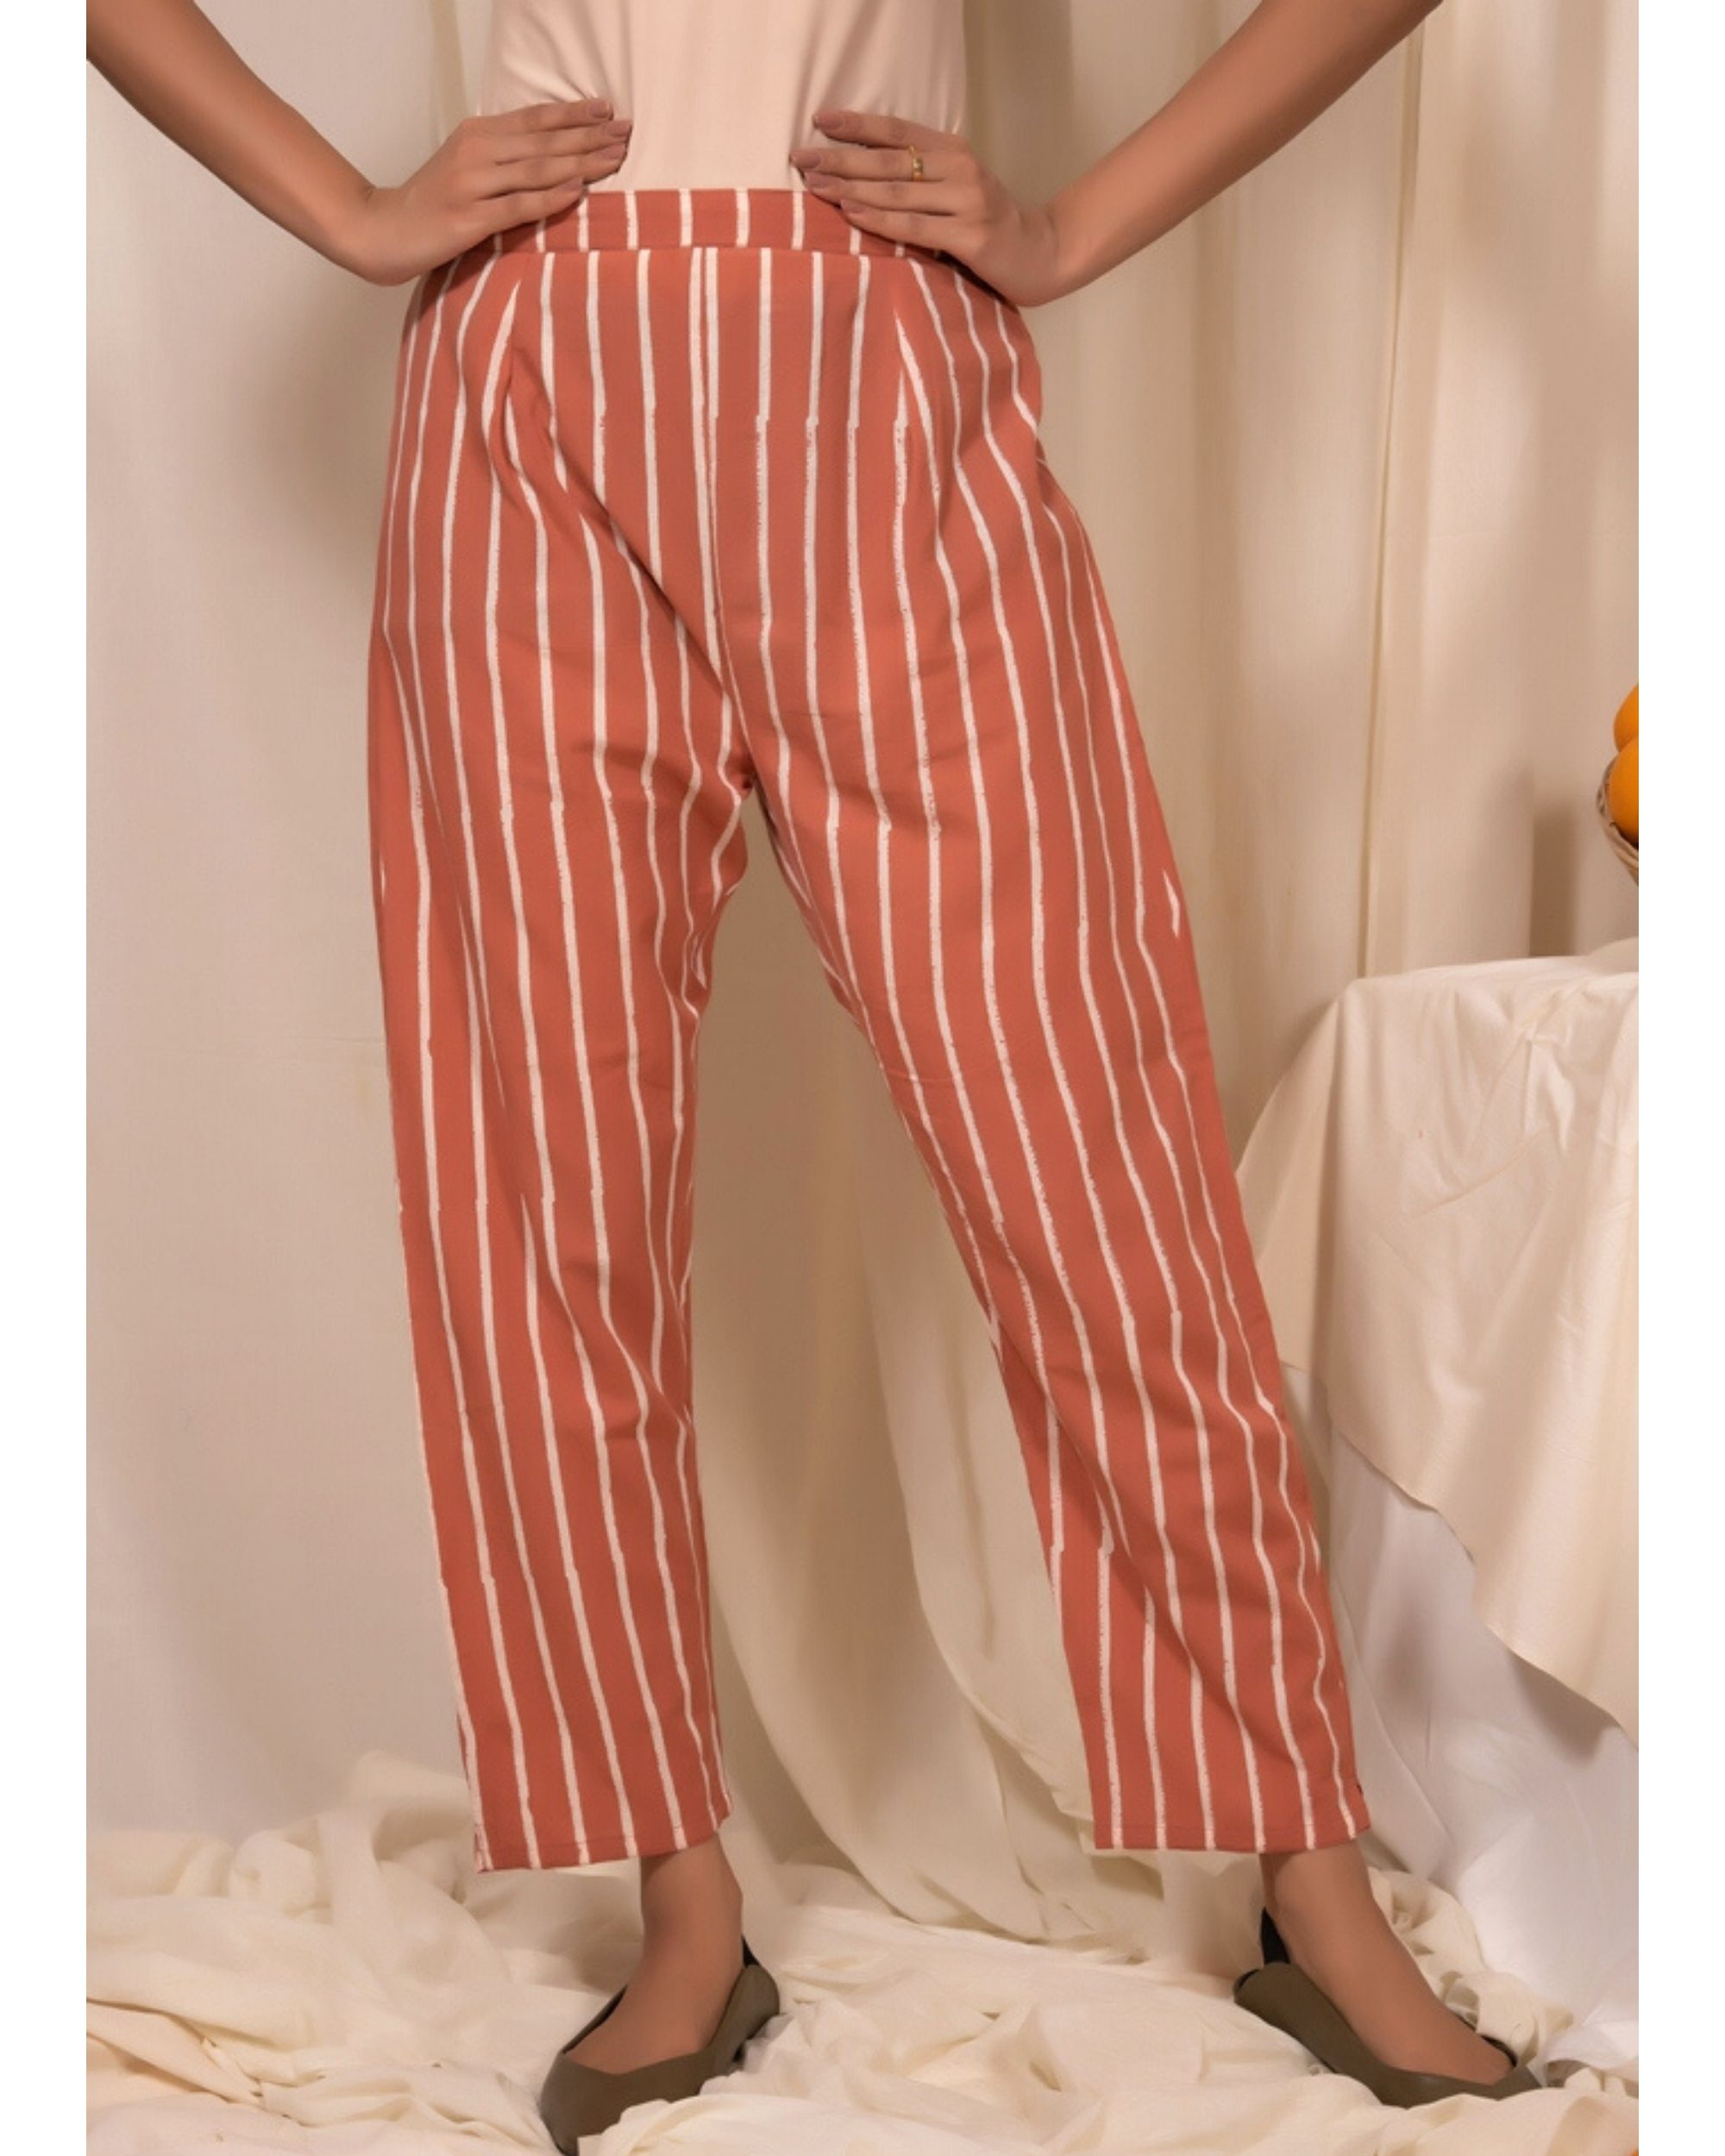 Peach striped pants